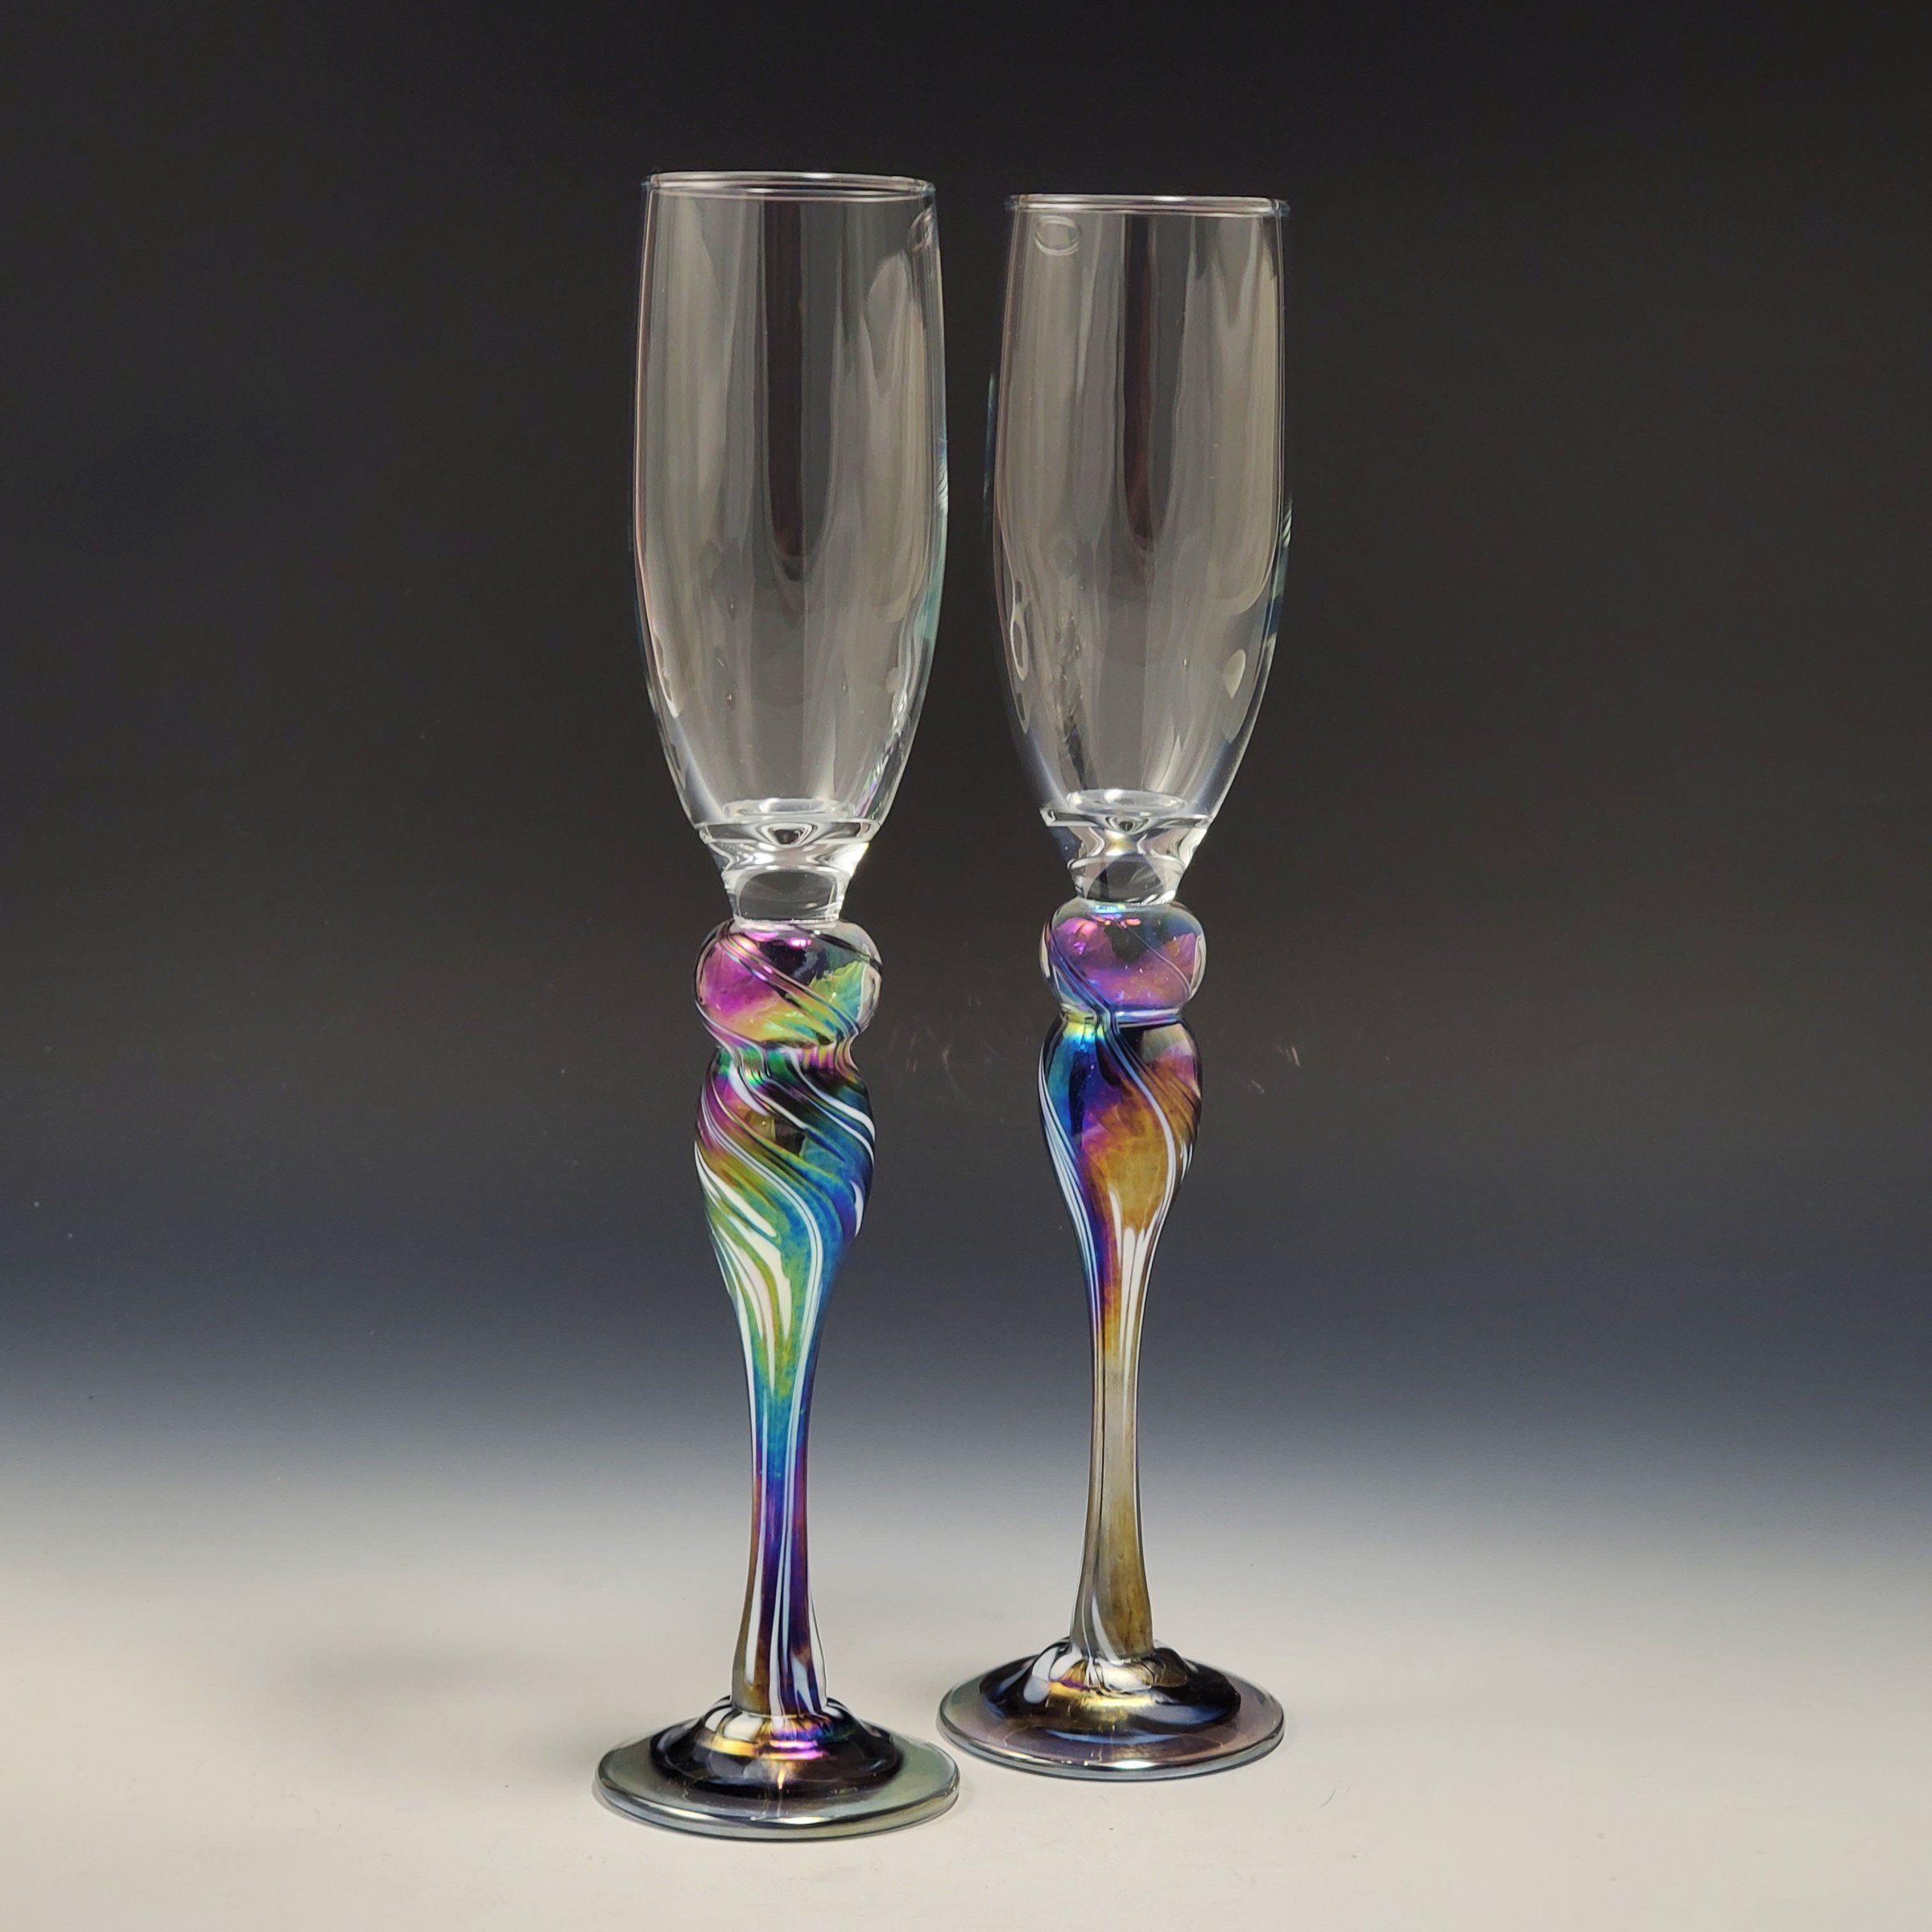 Champagne Glass By Mark Rosenbaum Art Glass Drinkware Artful Home